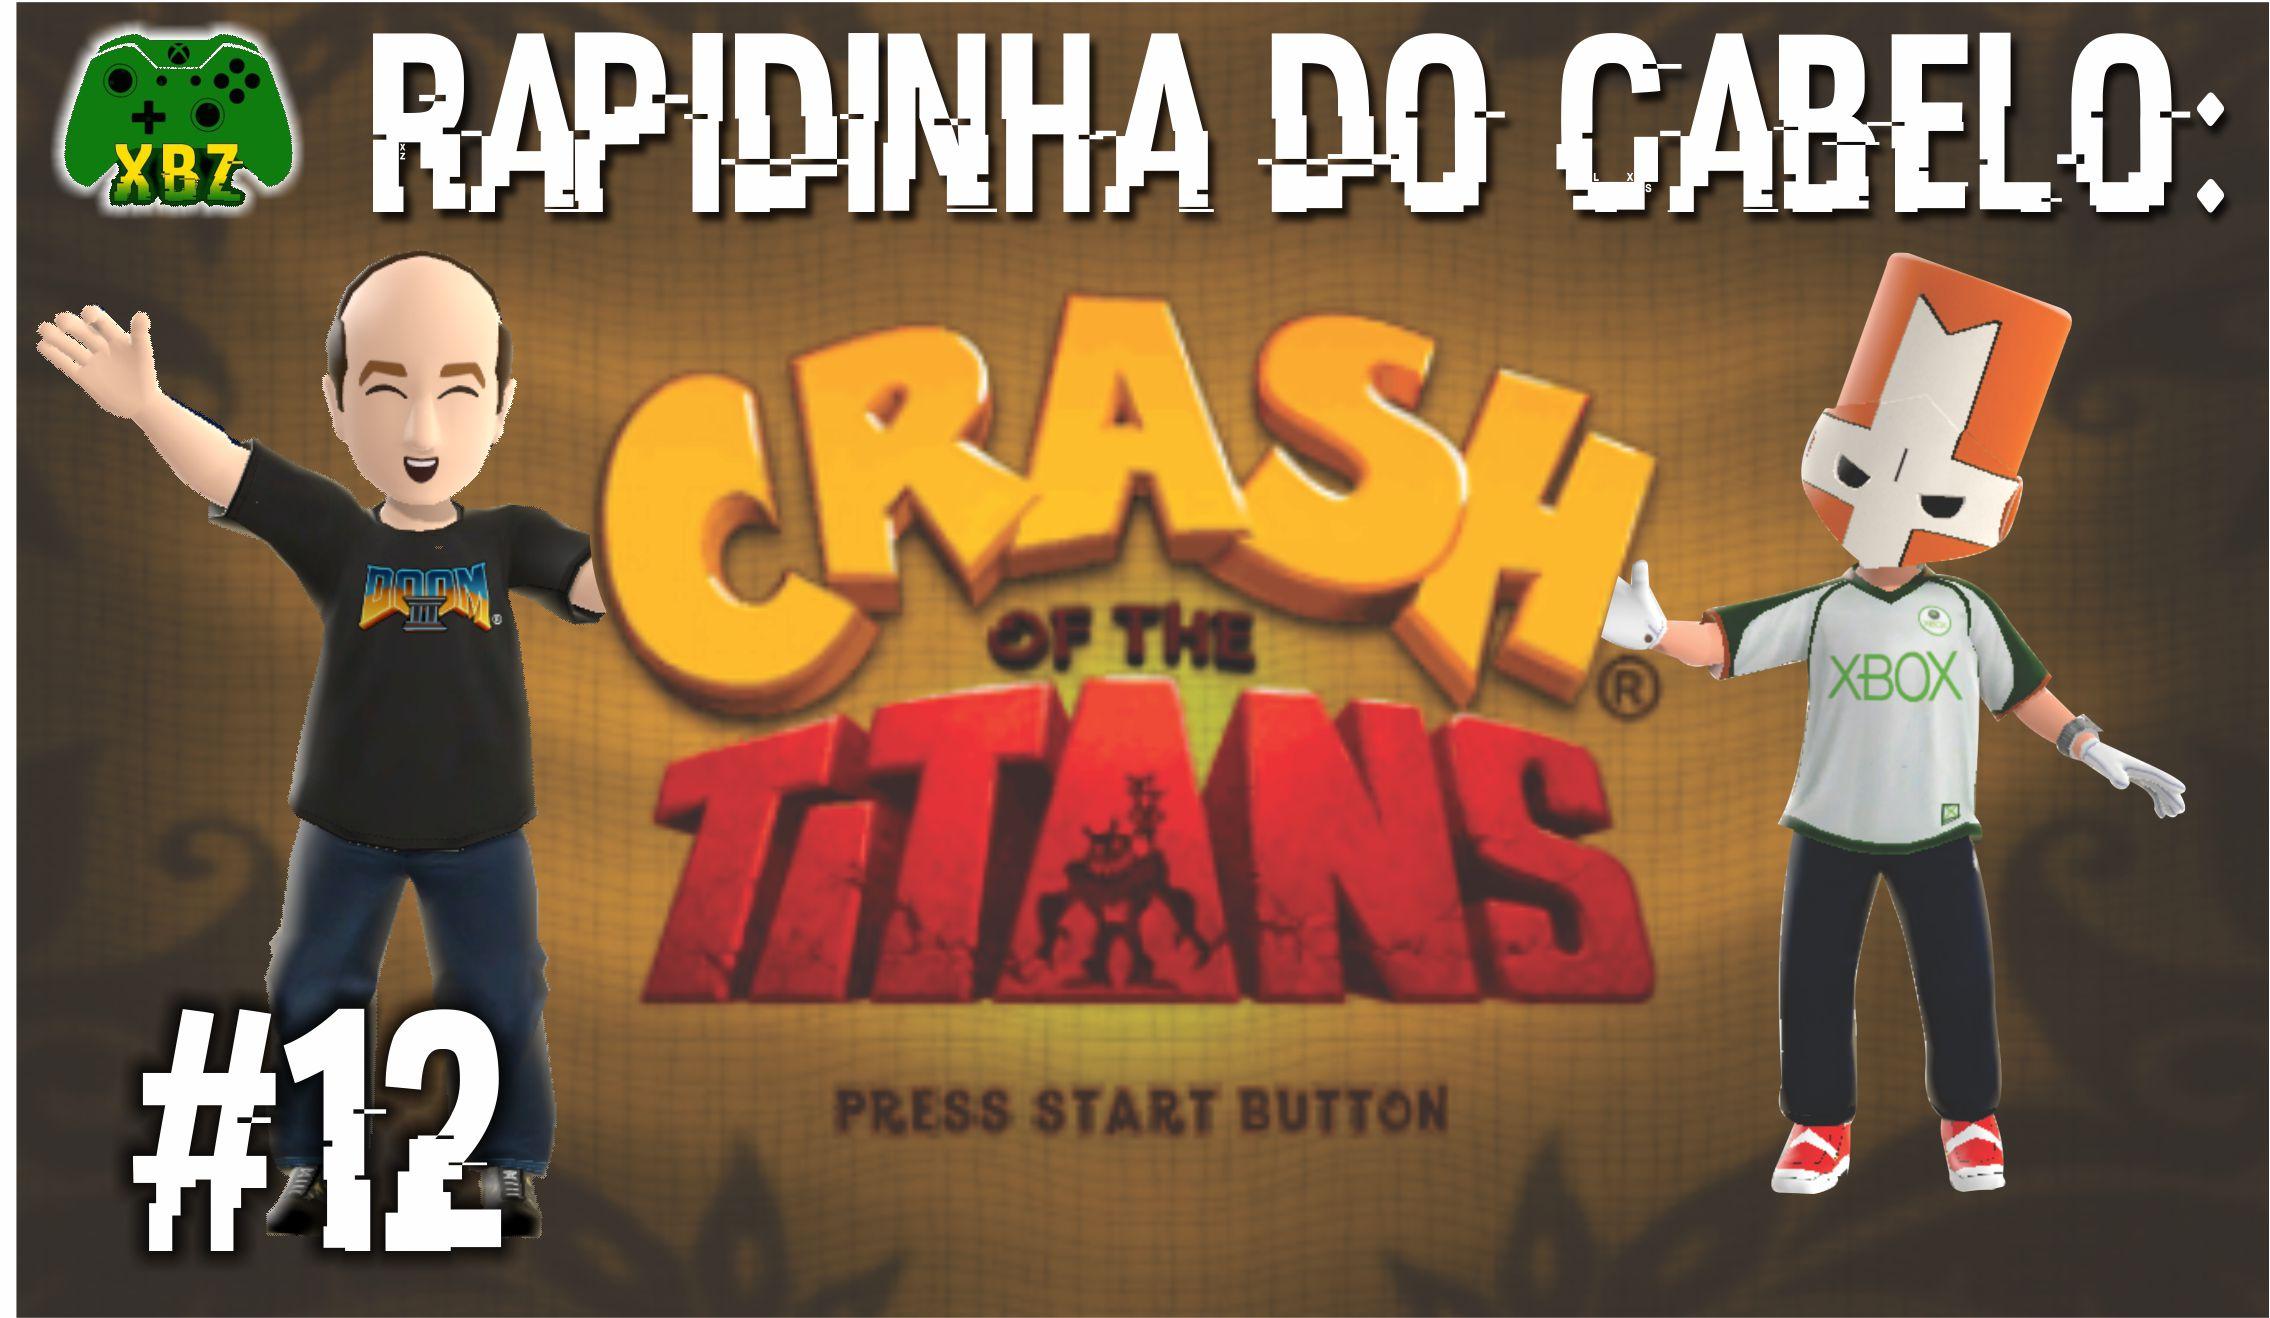 Crash Bandicoot of the Titans